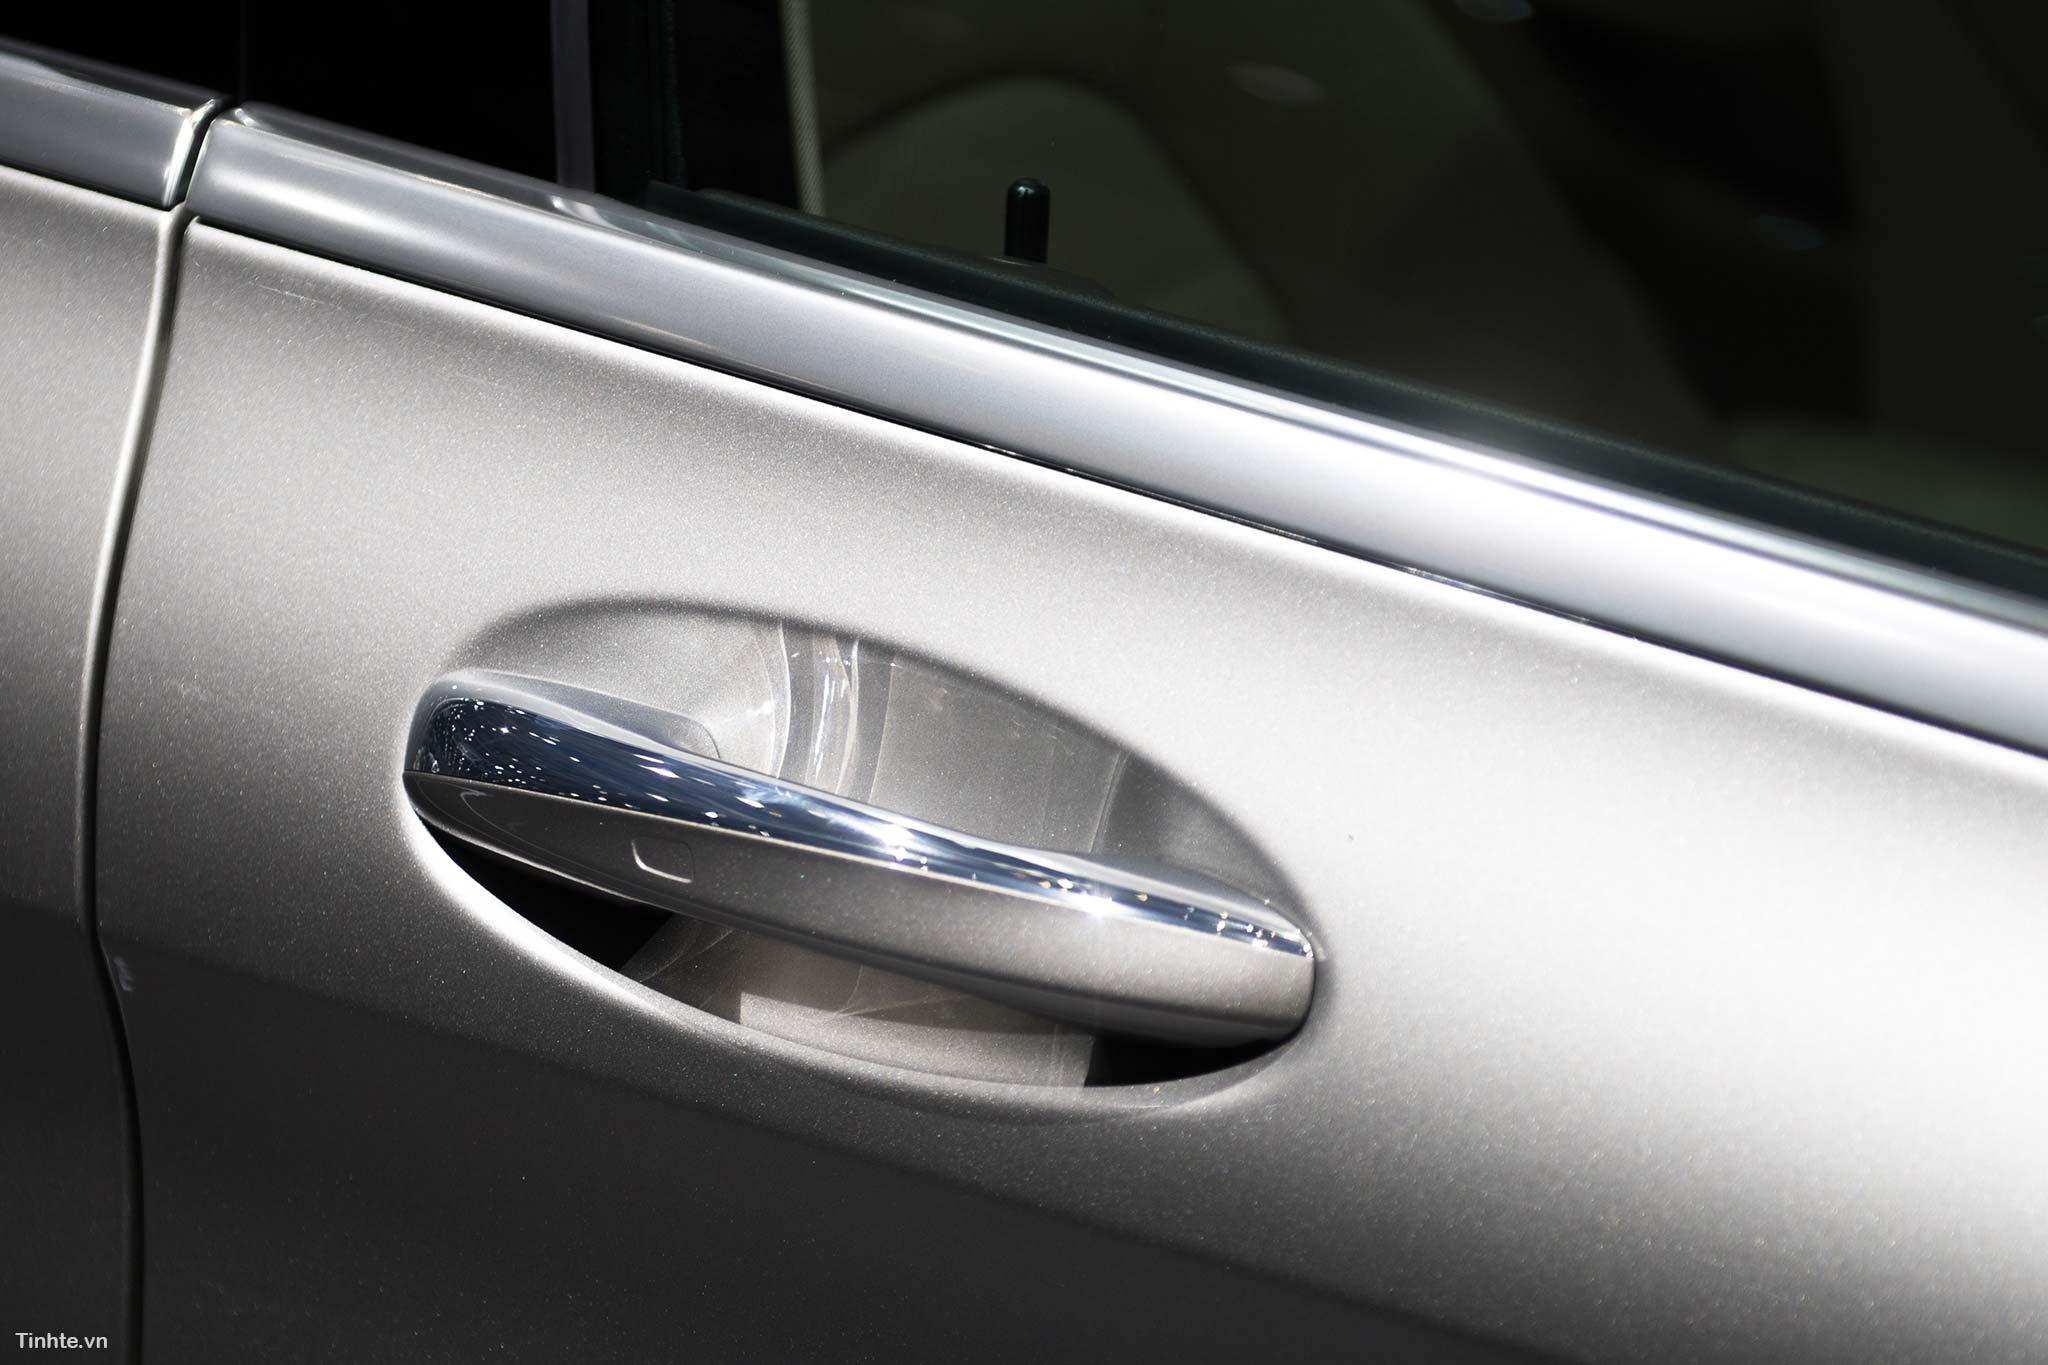 tinhte_Mercedes-Benz-C-200-4MATIC-9.jpg